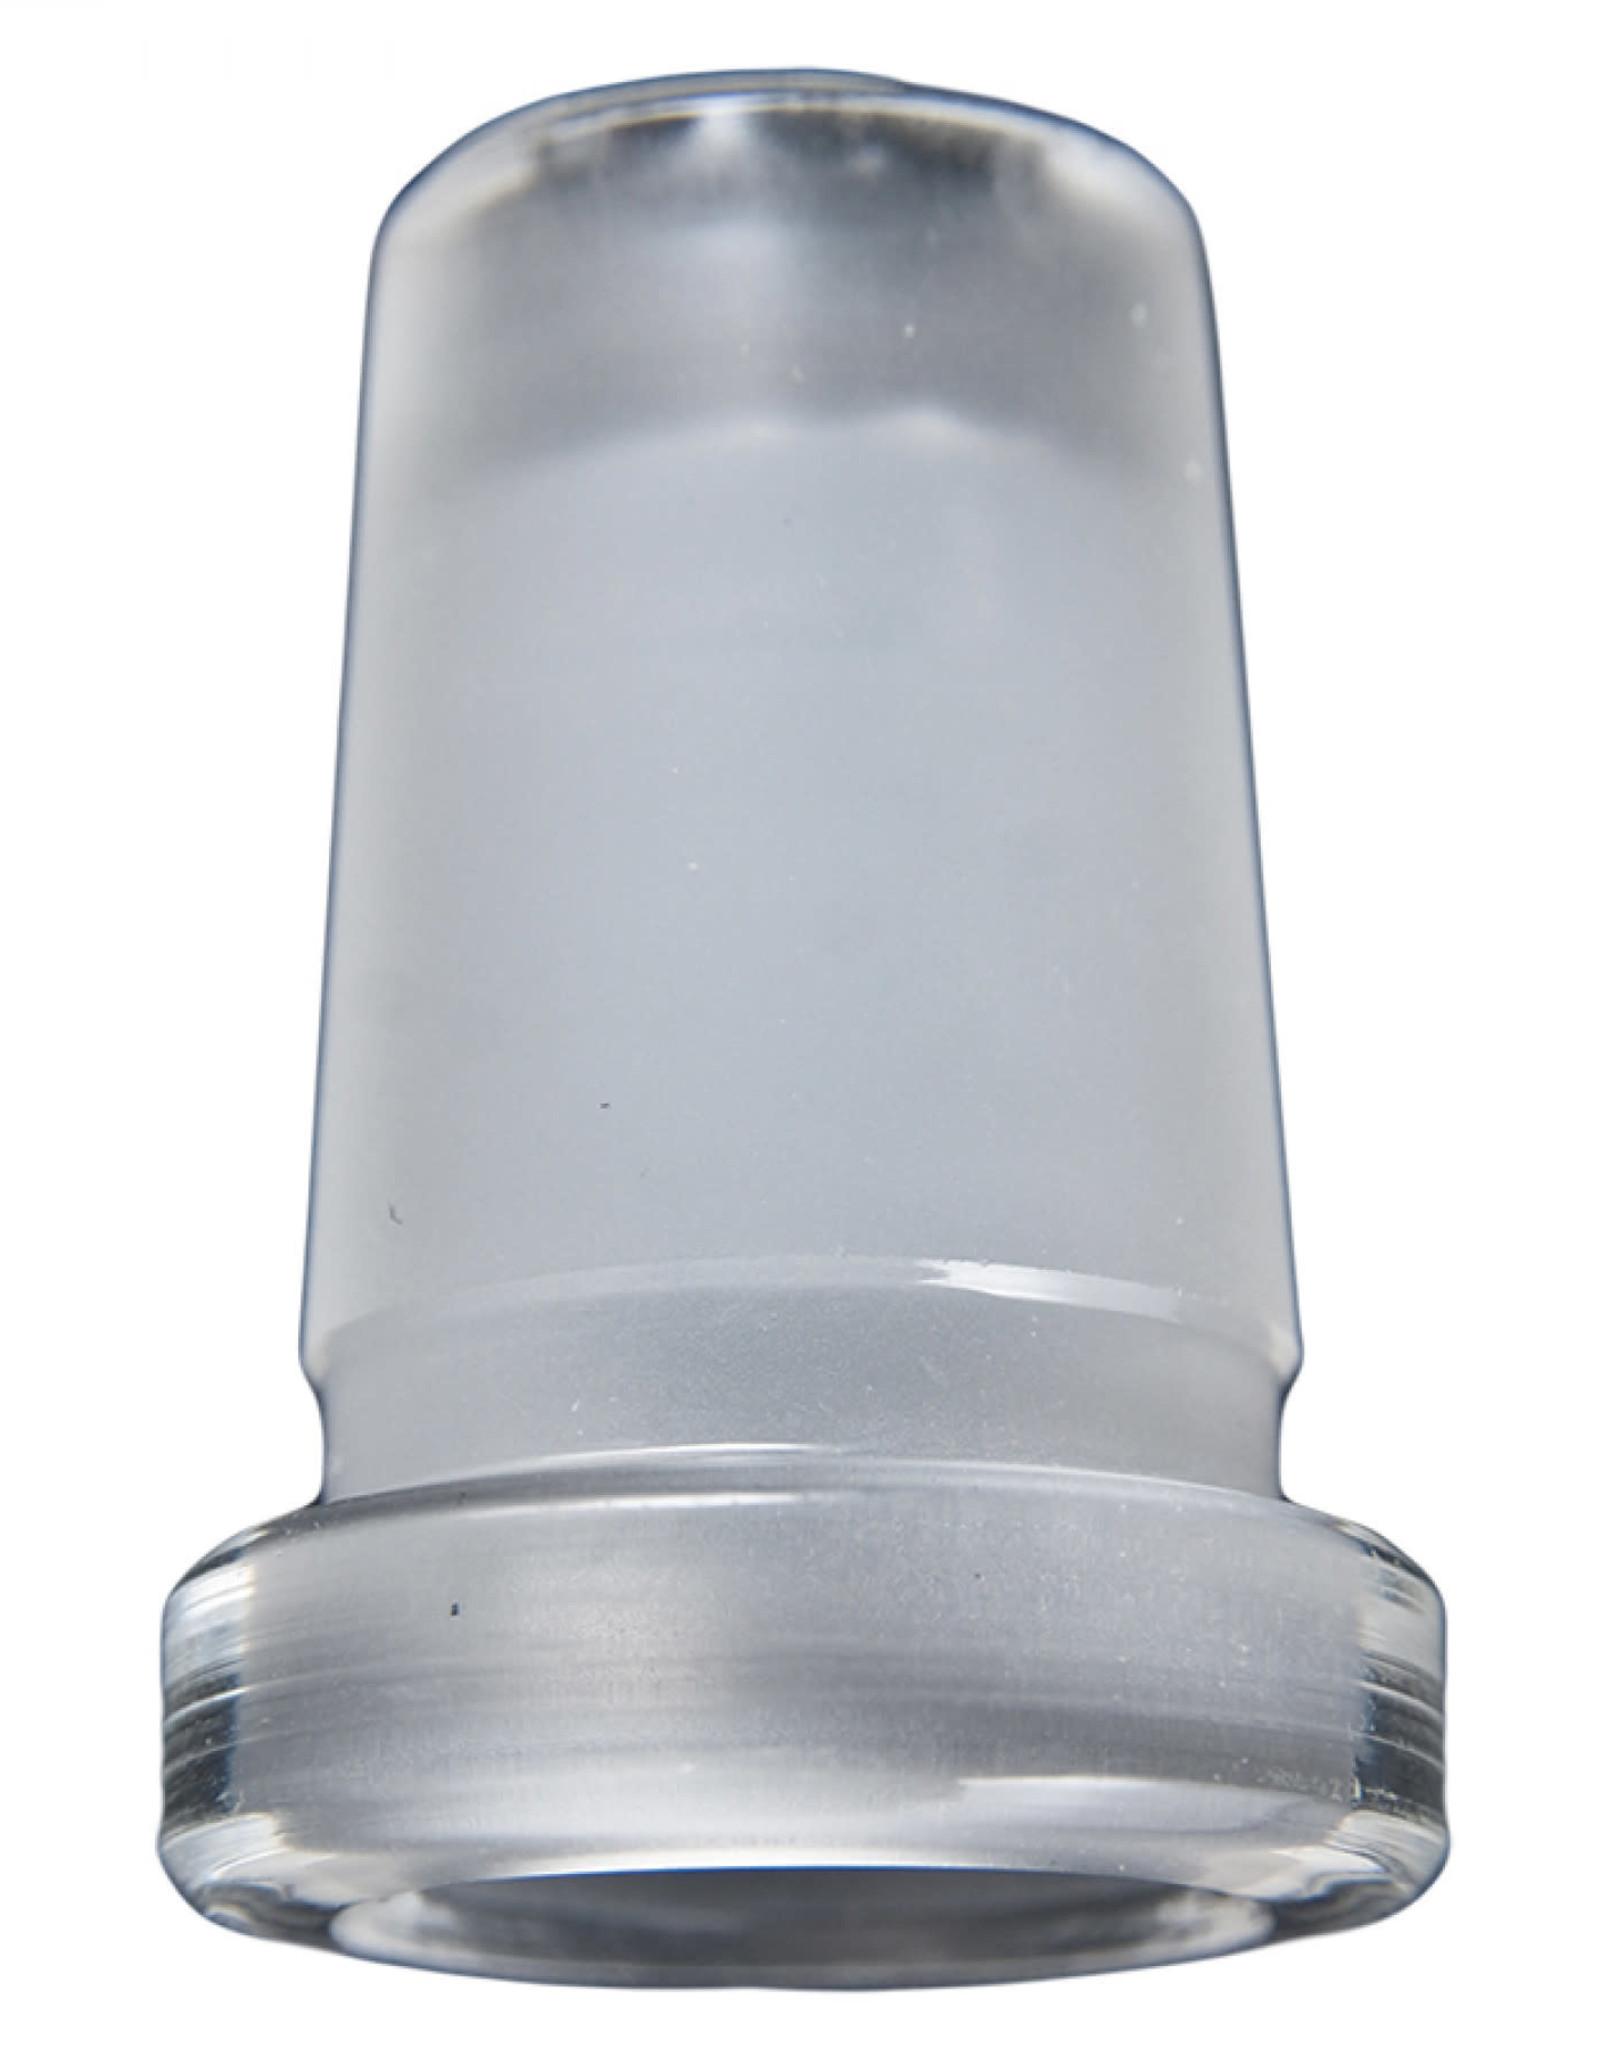 Gear G89 downsize interchanger 100% borosilicate glass, fits 14mm to 19mm